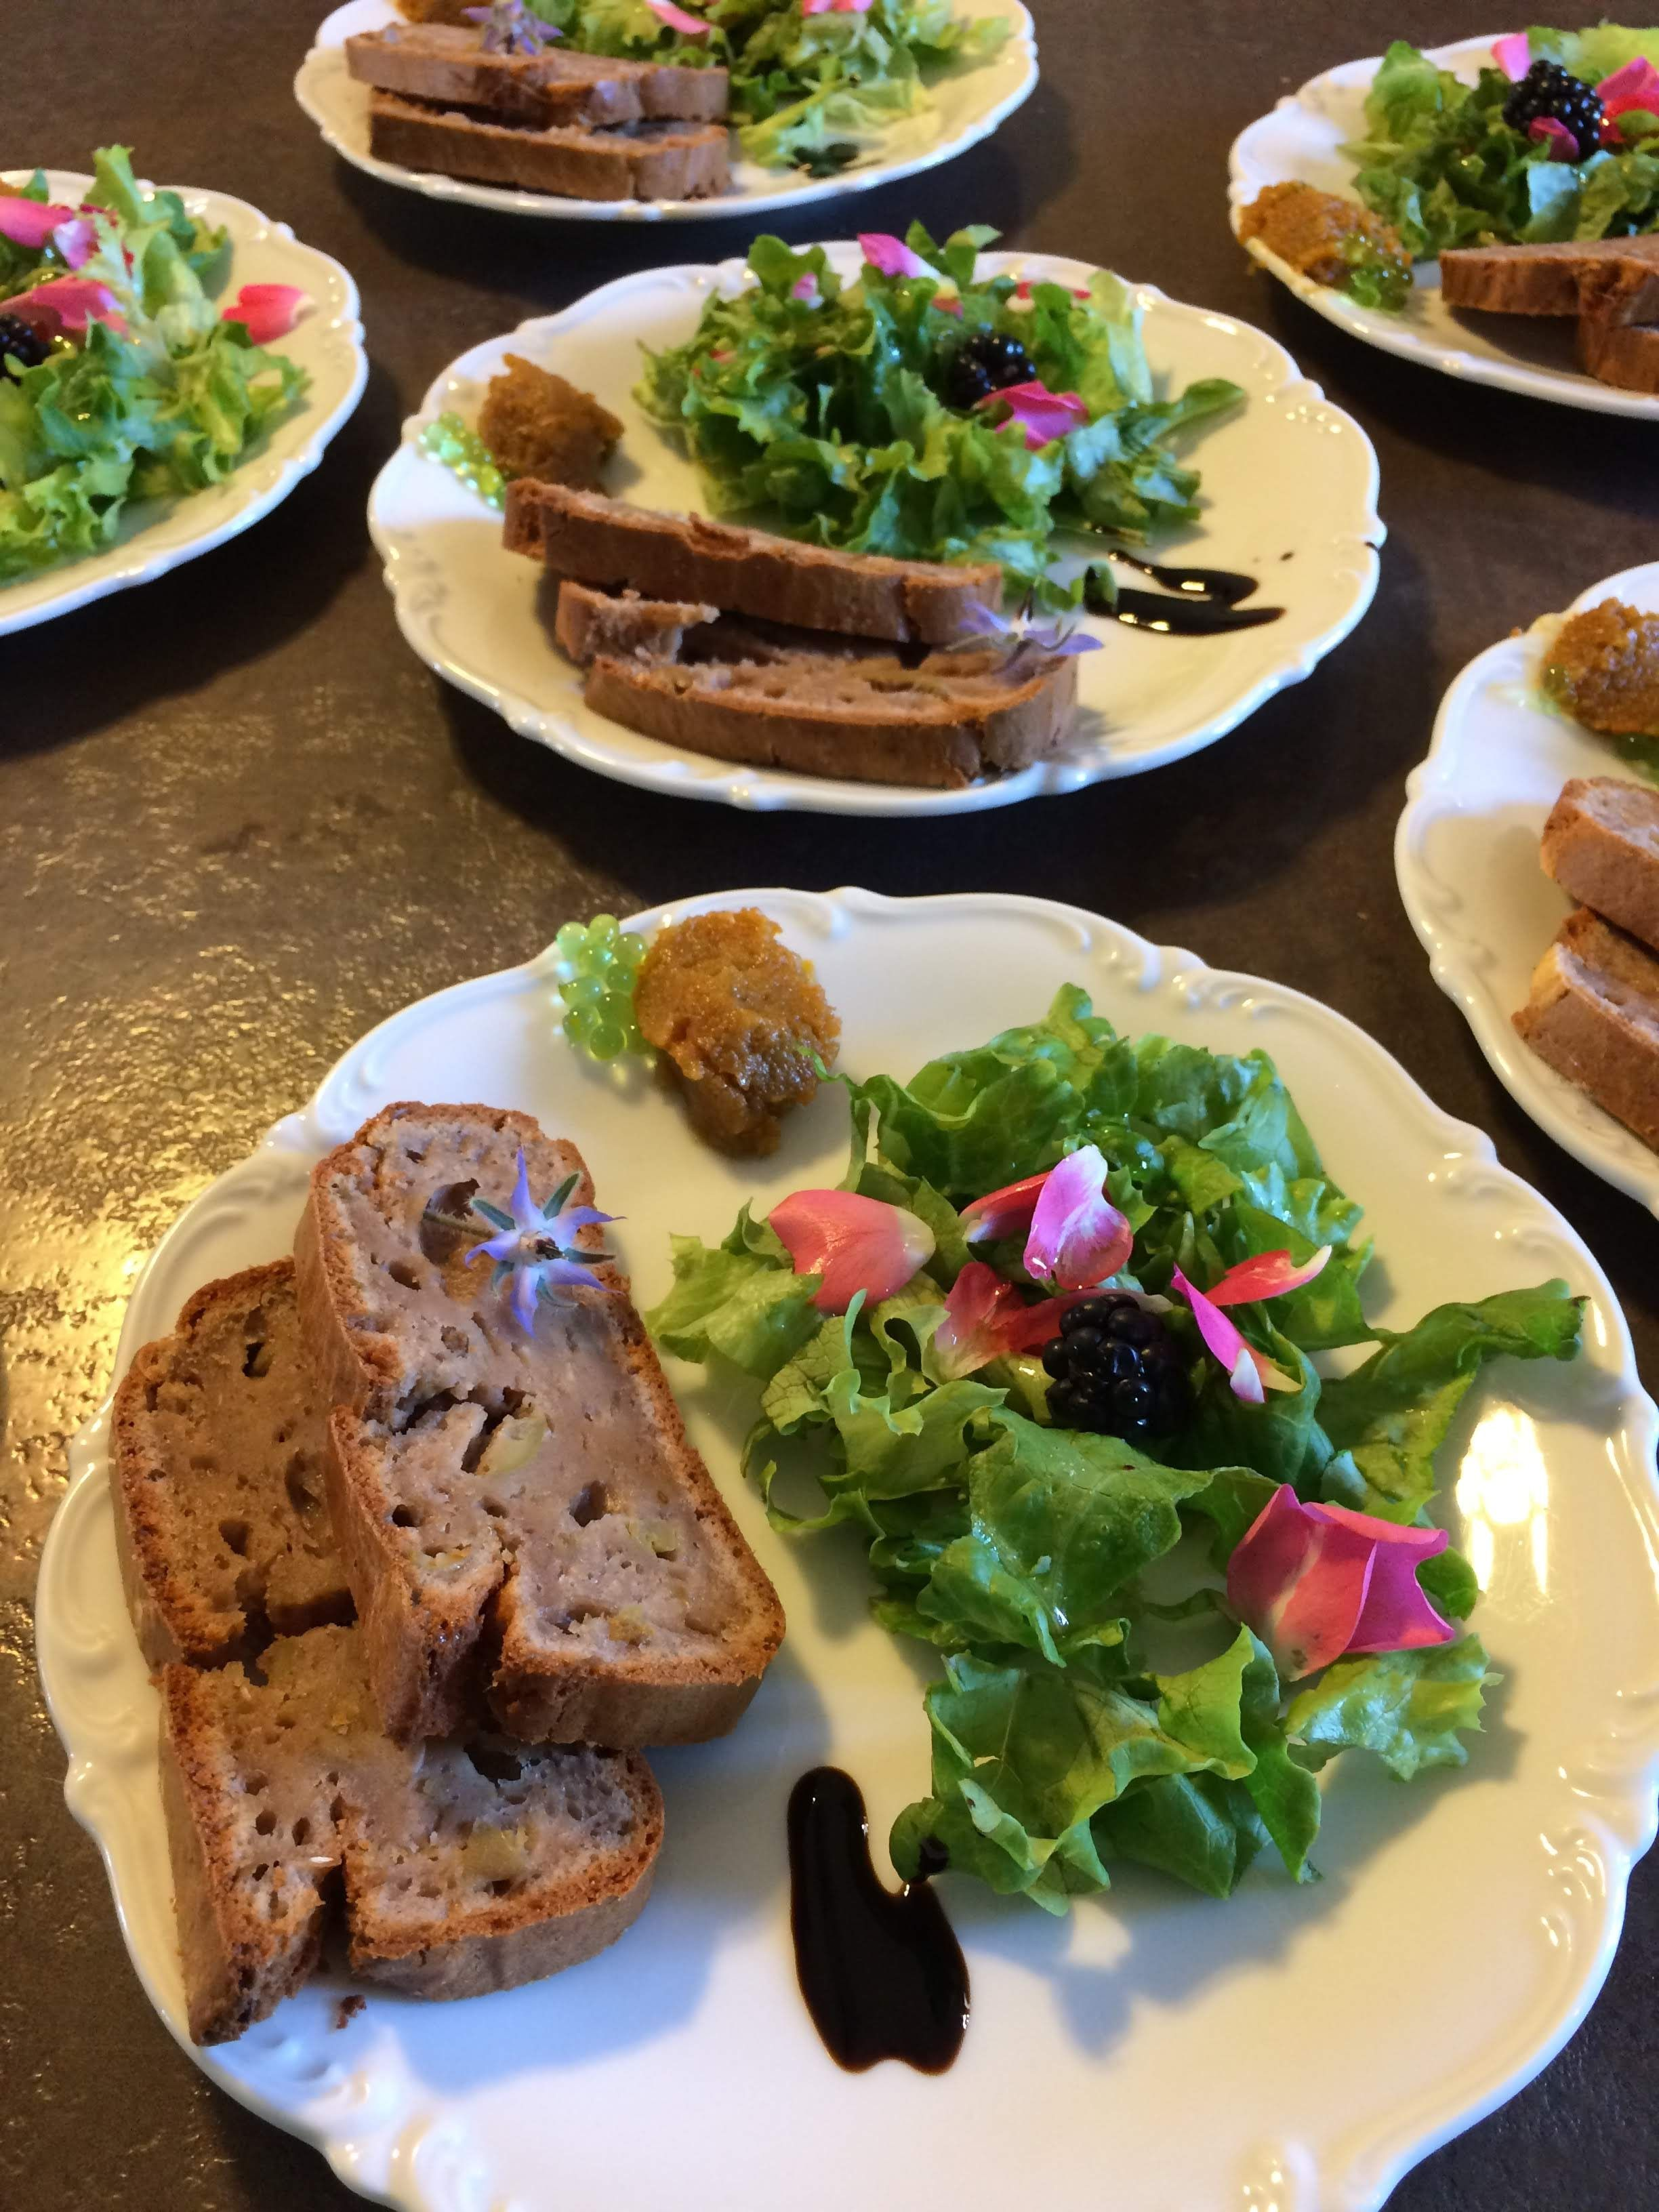 gite-oasis-toulouse-table-hote-assiette-repas